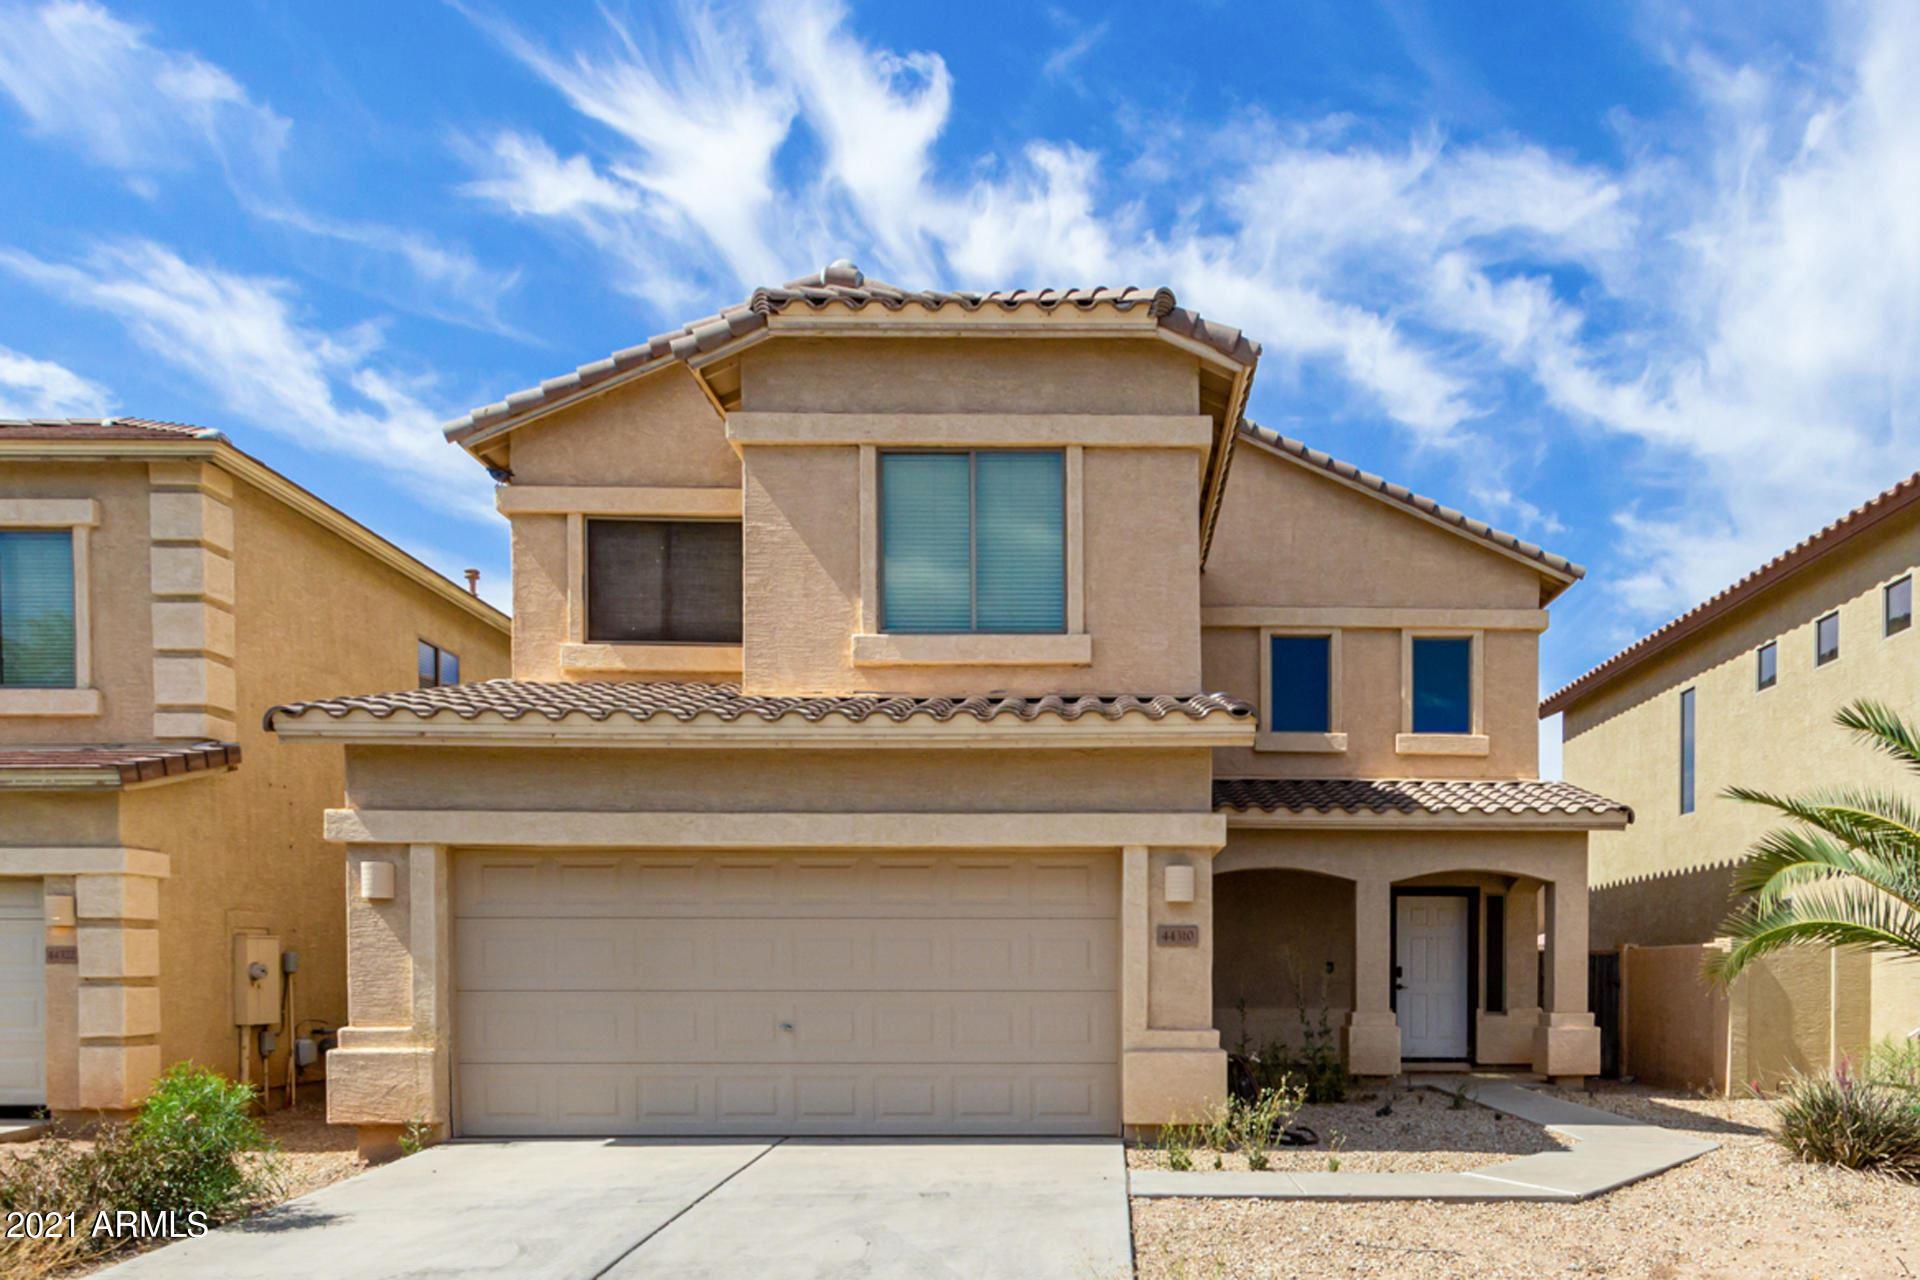 Photo for 44310 W CYPRESS Lane, Maricopa, AZ 85138 (MLS # 6247859)